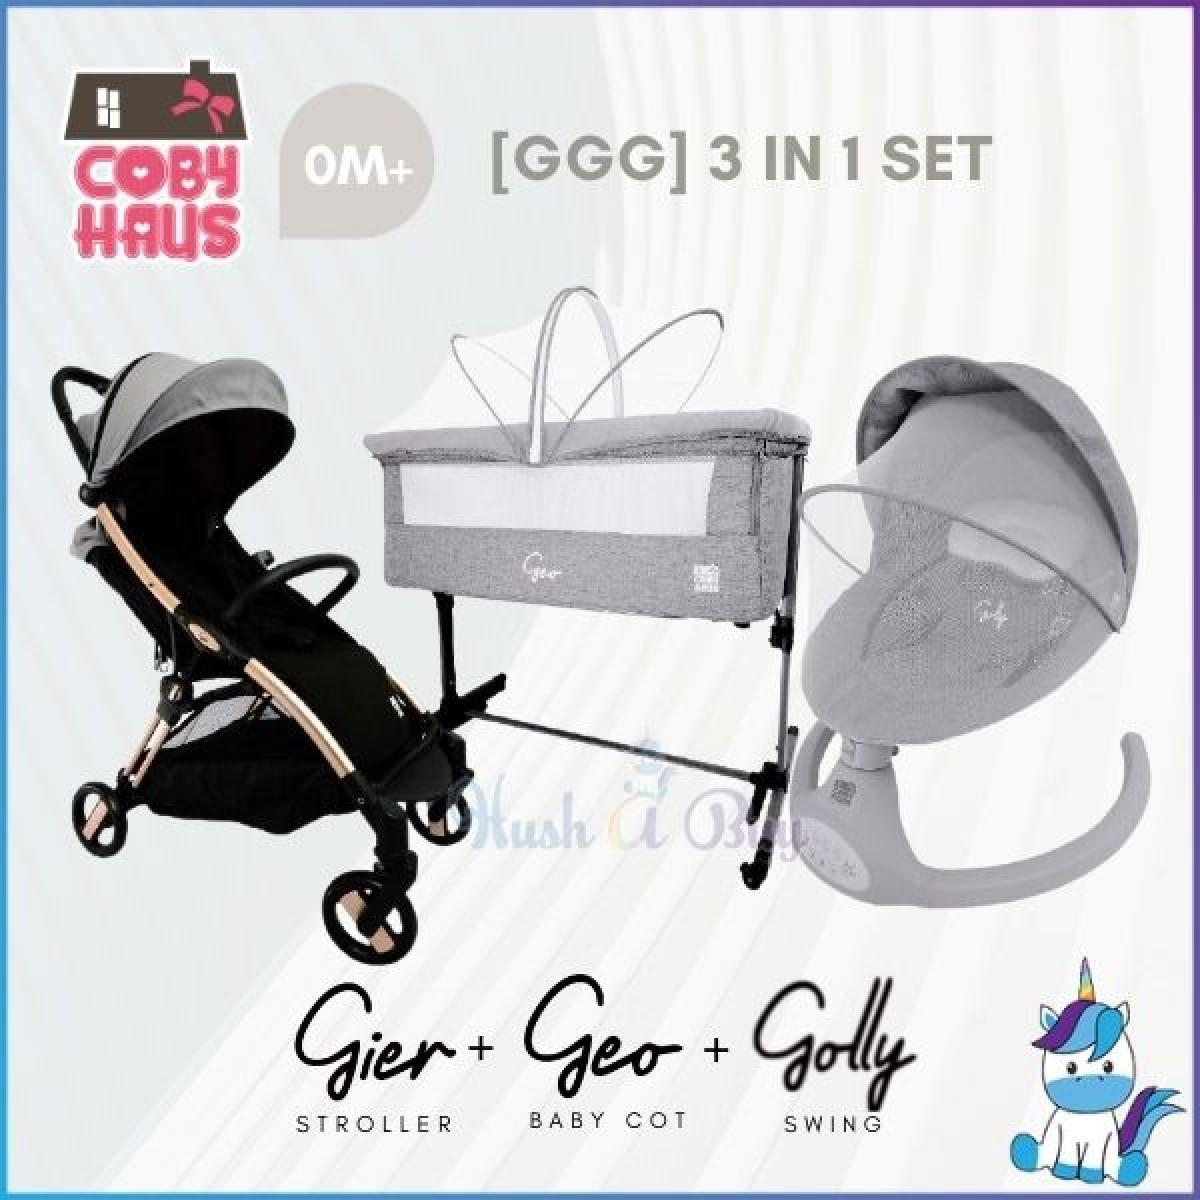 Coby Haus [GGG] 3in1 Set – Gier Stroller & Geo Baby Cot & Golly Swing - 1 Year Warranty